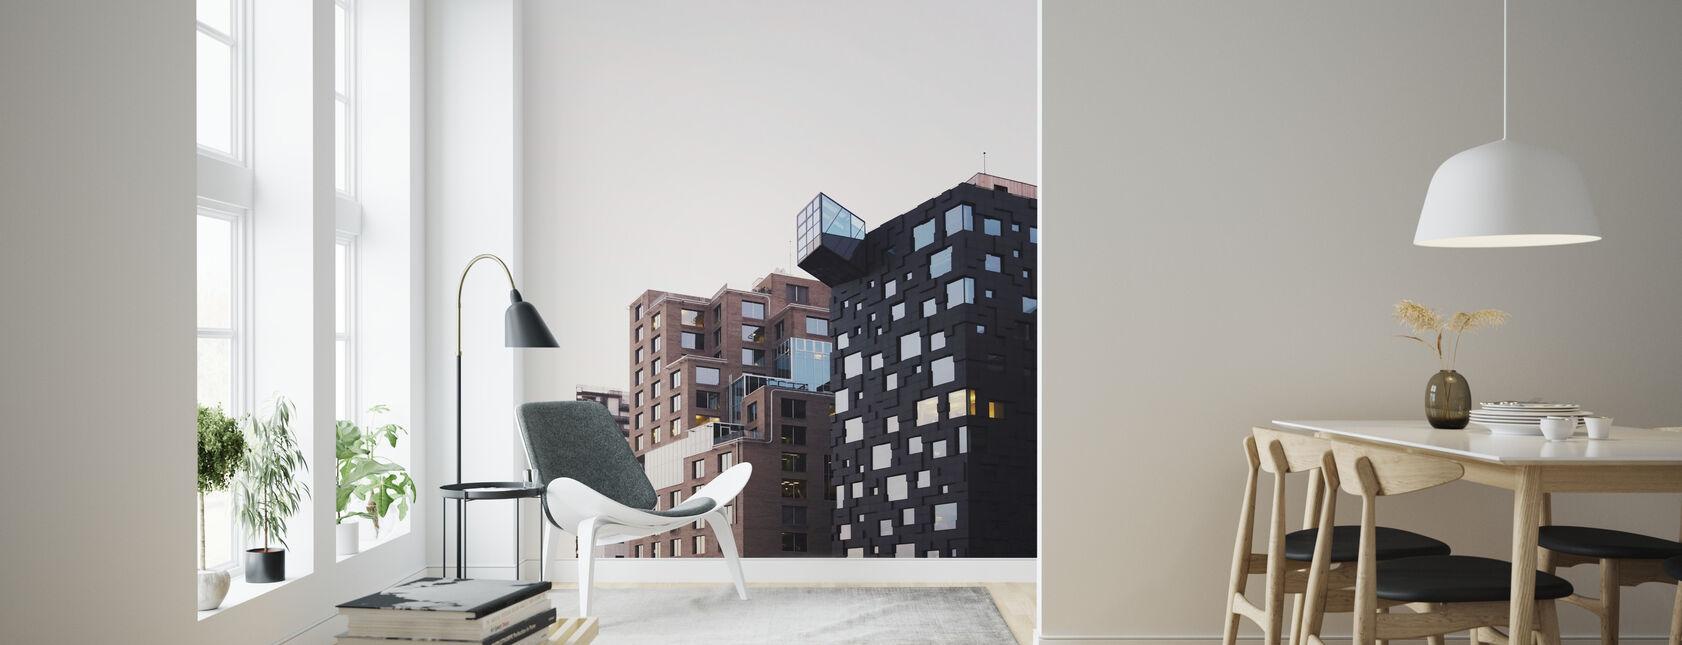 Apartment Blocks - Wallpaper - Living Room